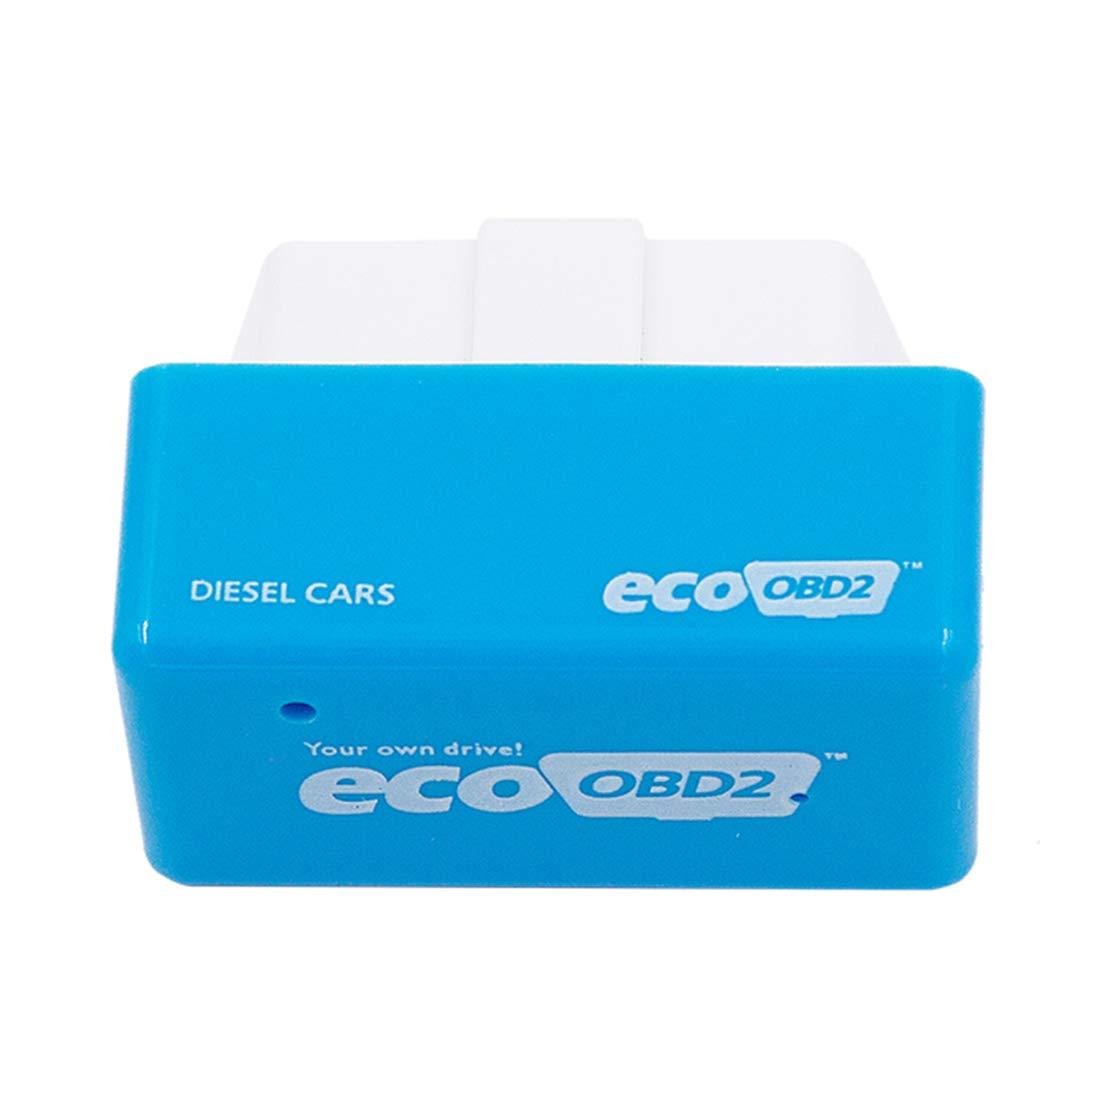 OBDII Plug&Drive Lower Fuel Saver Lower Emission OBDII Interface Diesel Gasoline Car Chip Tuning Box Eco OBDII Basico